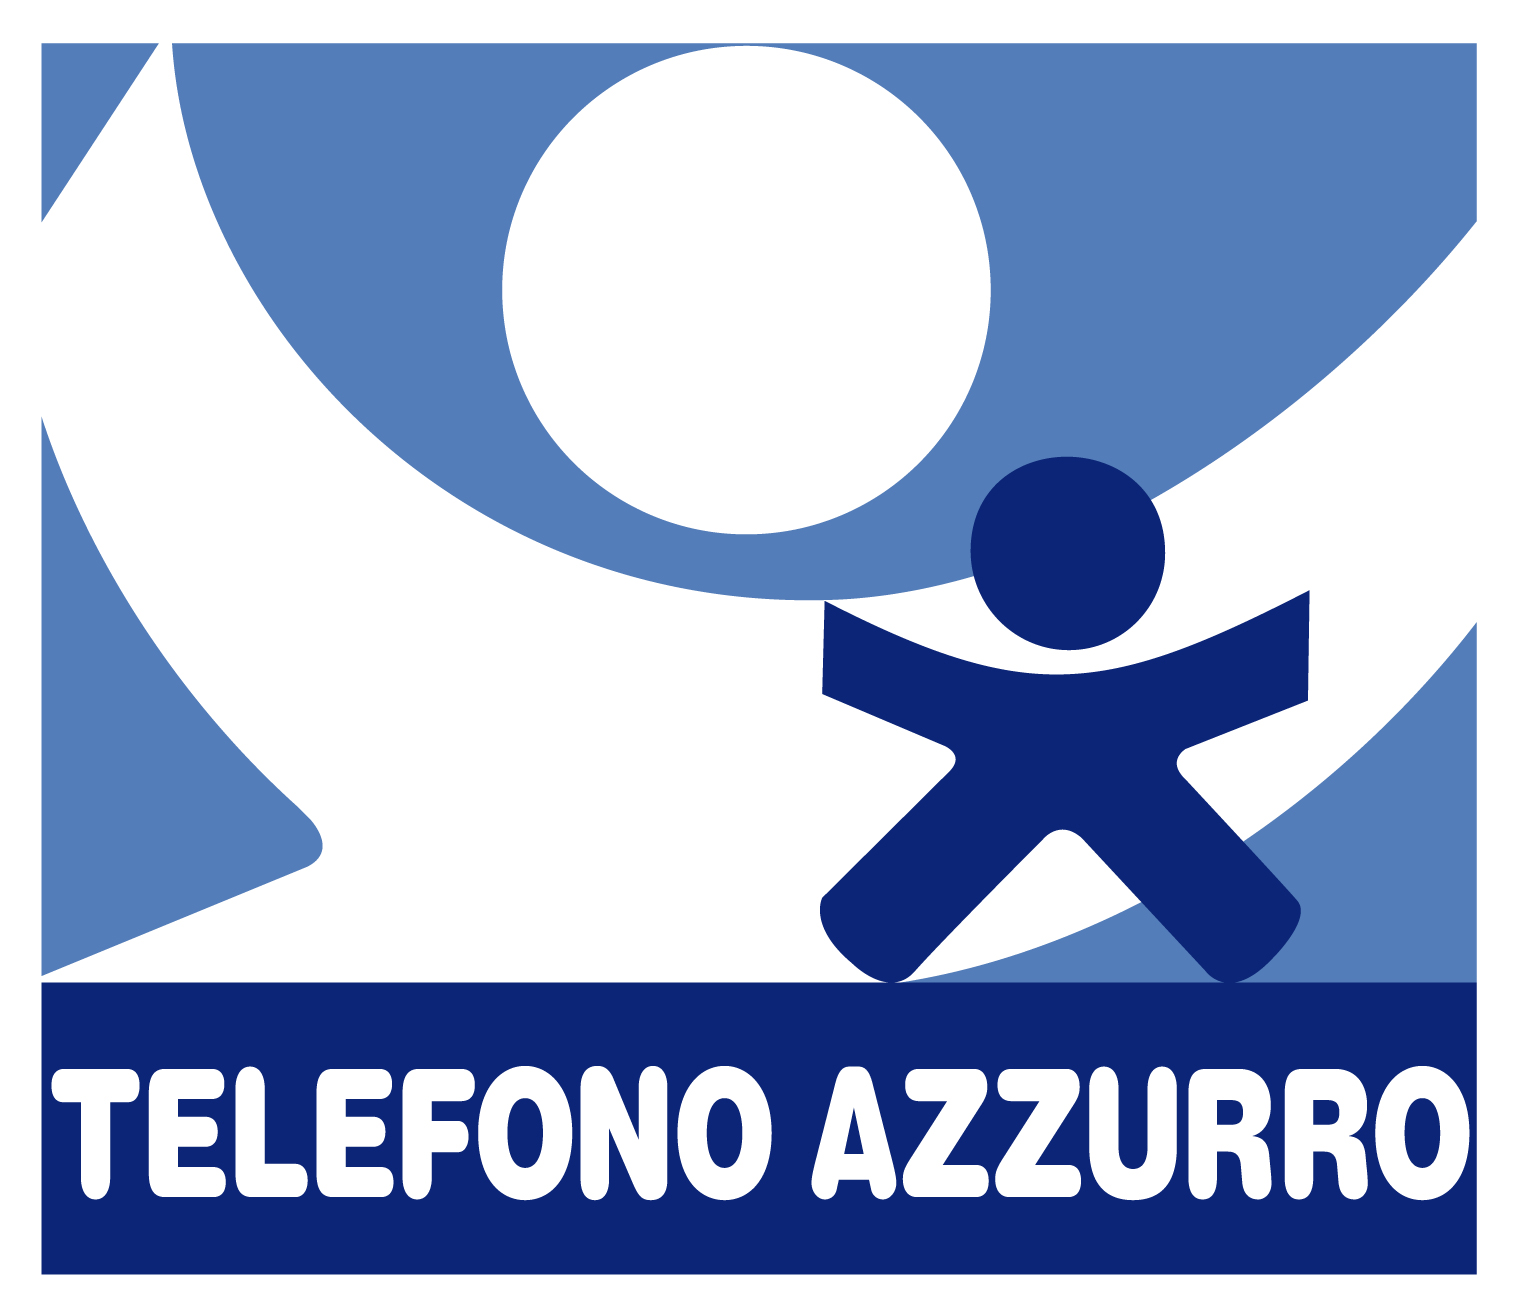 digital marketing trends - telefono azzurro